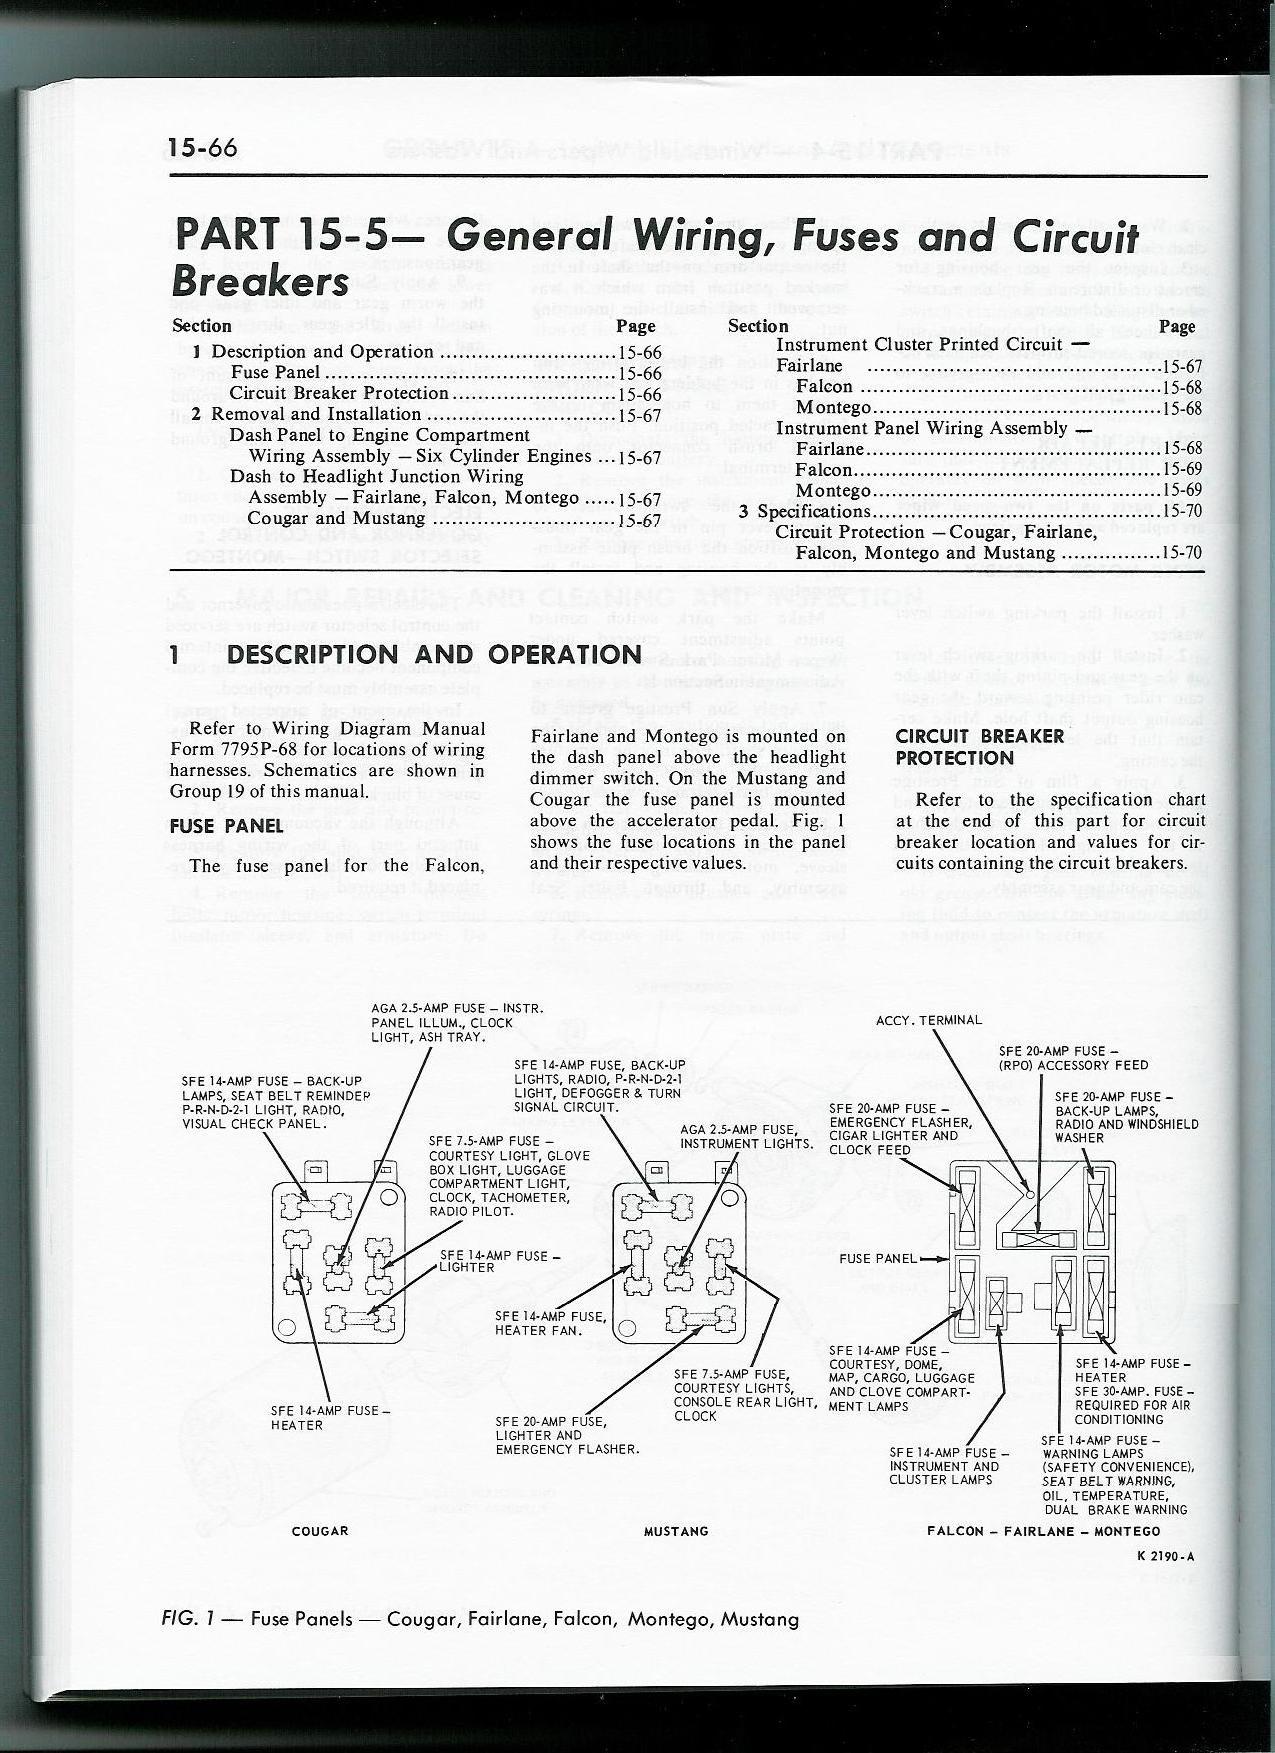 1965 Ford Mustang Fuse Box Diagram - Wiring Diagrams